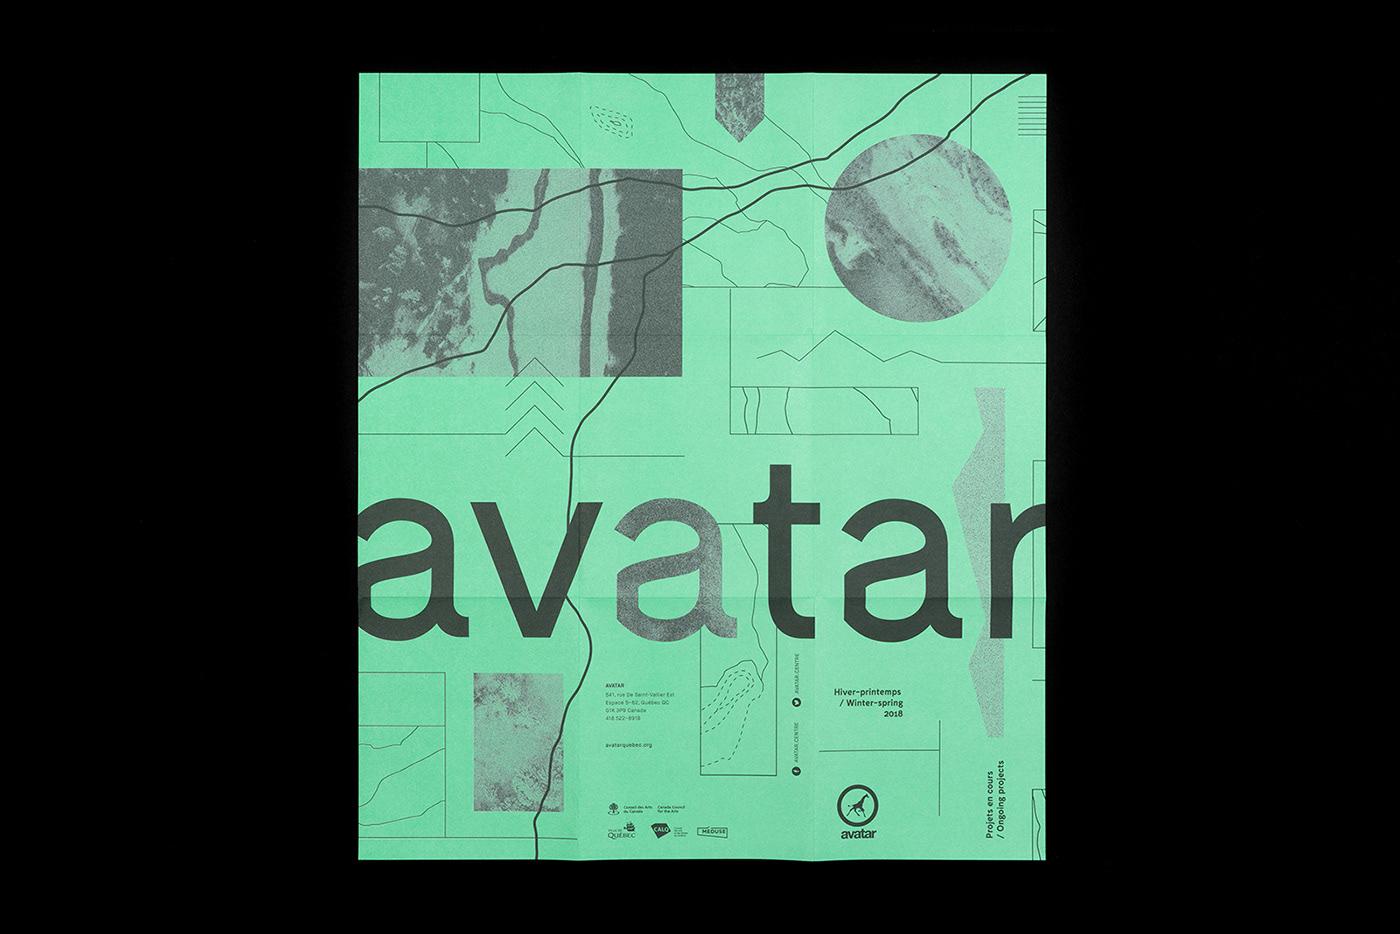 Artist center,brochure,poster,pamphlet,Audio,electronic,creation,Production,Art Center